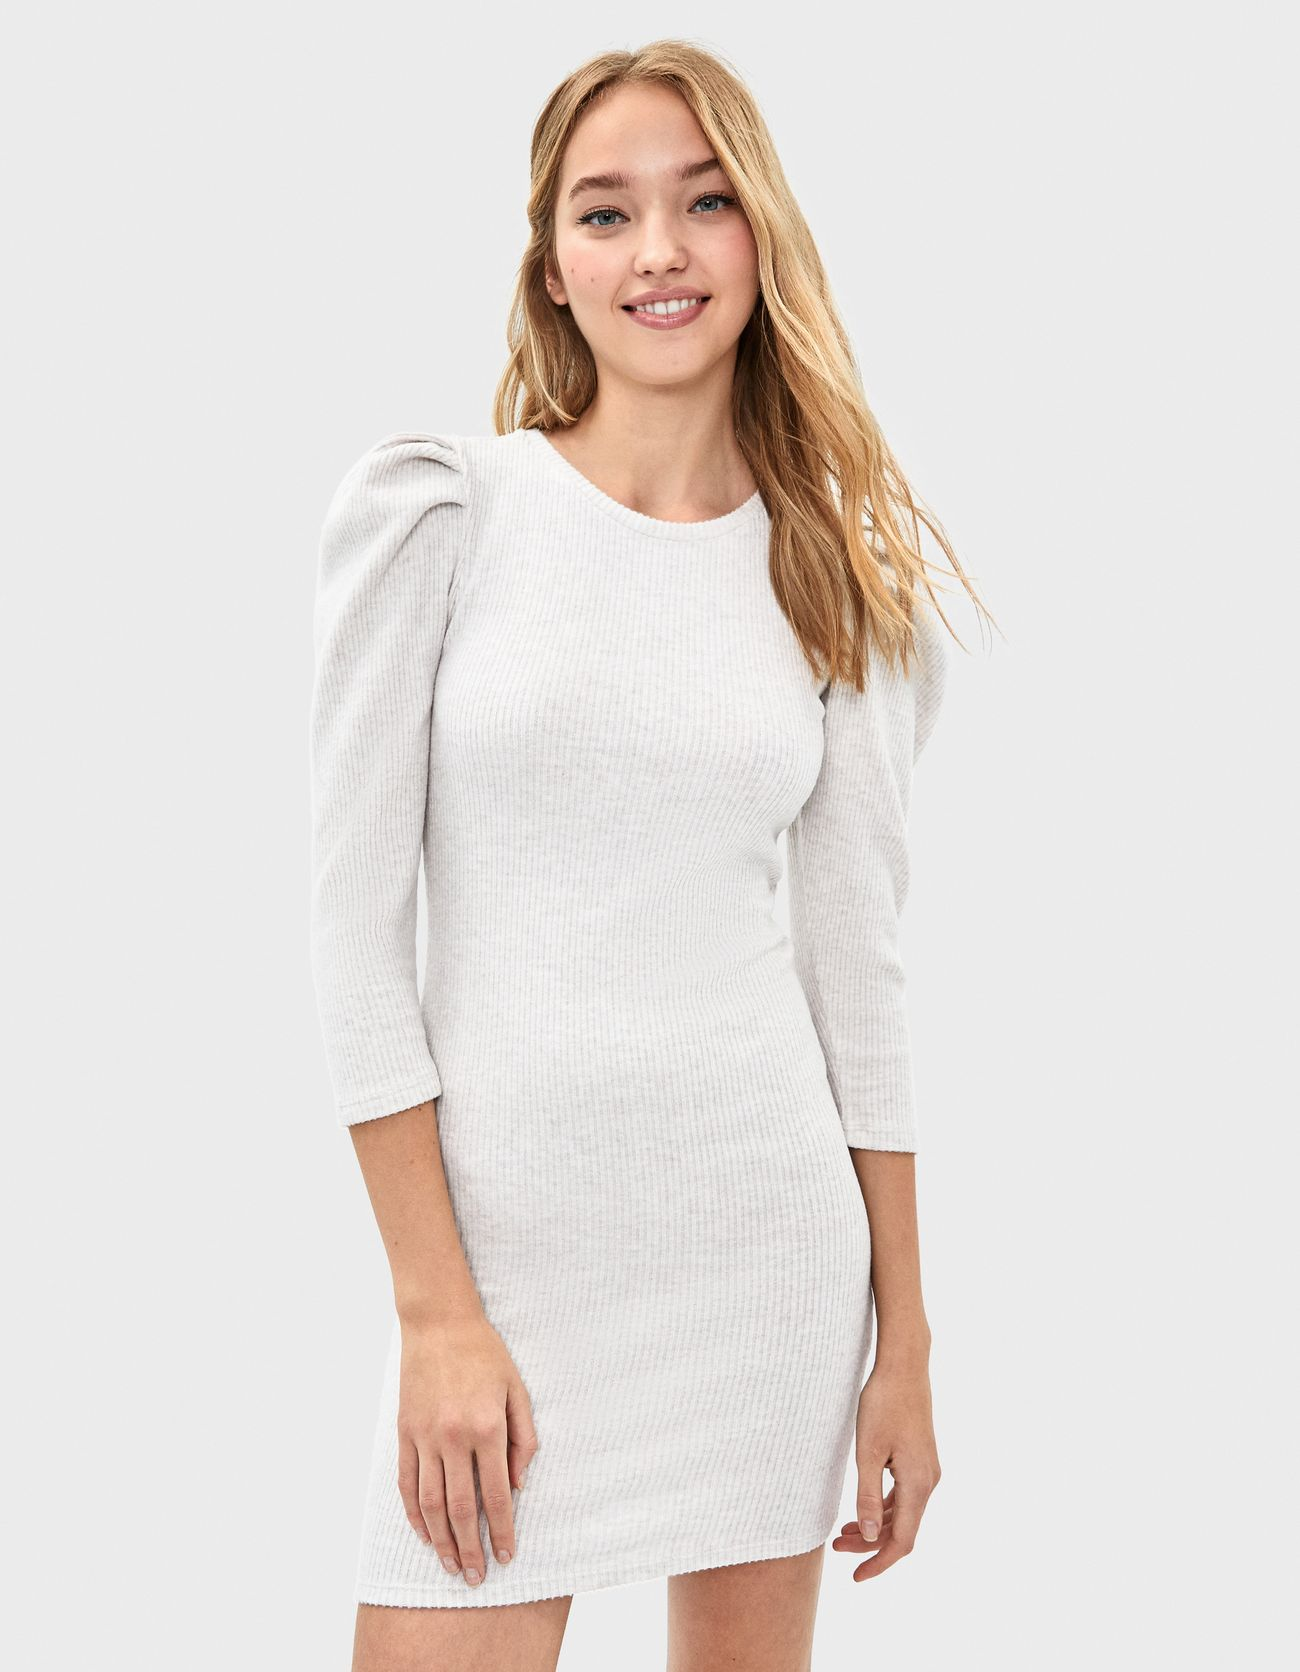 Платье с рукавами-фонариками БЕЖЕВЫЙ Bershka